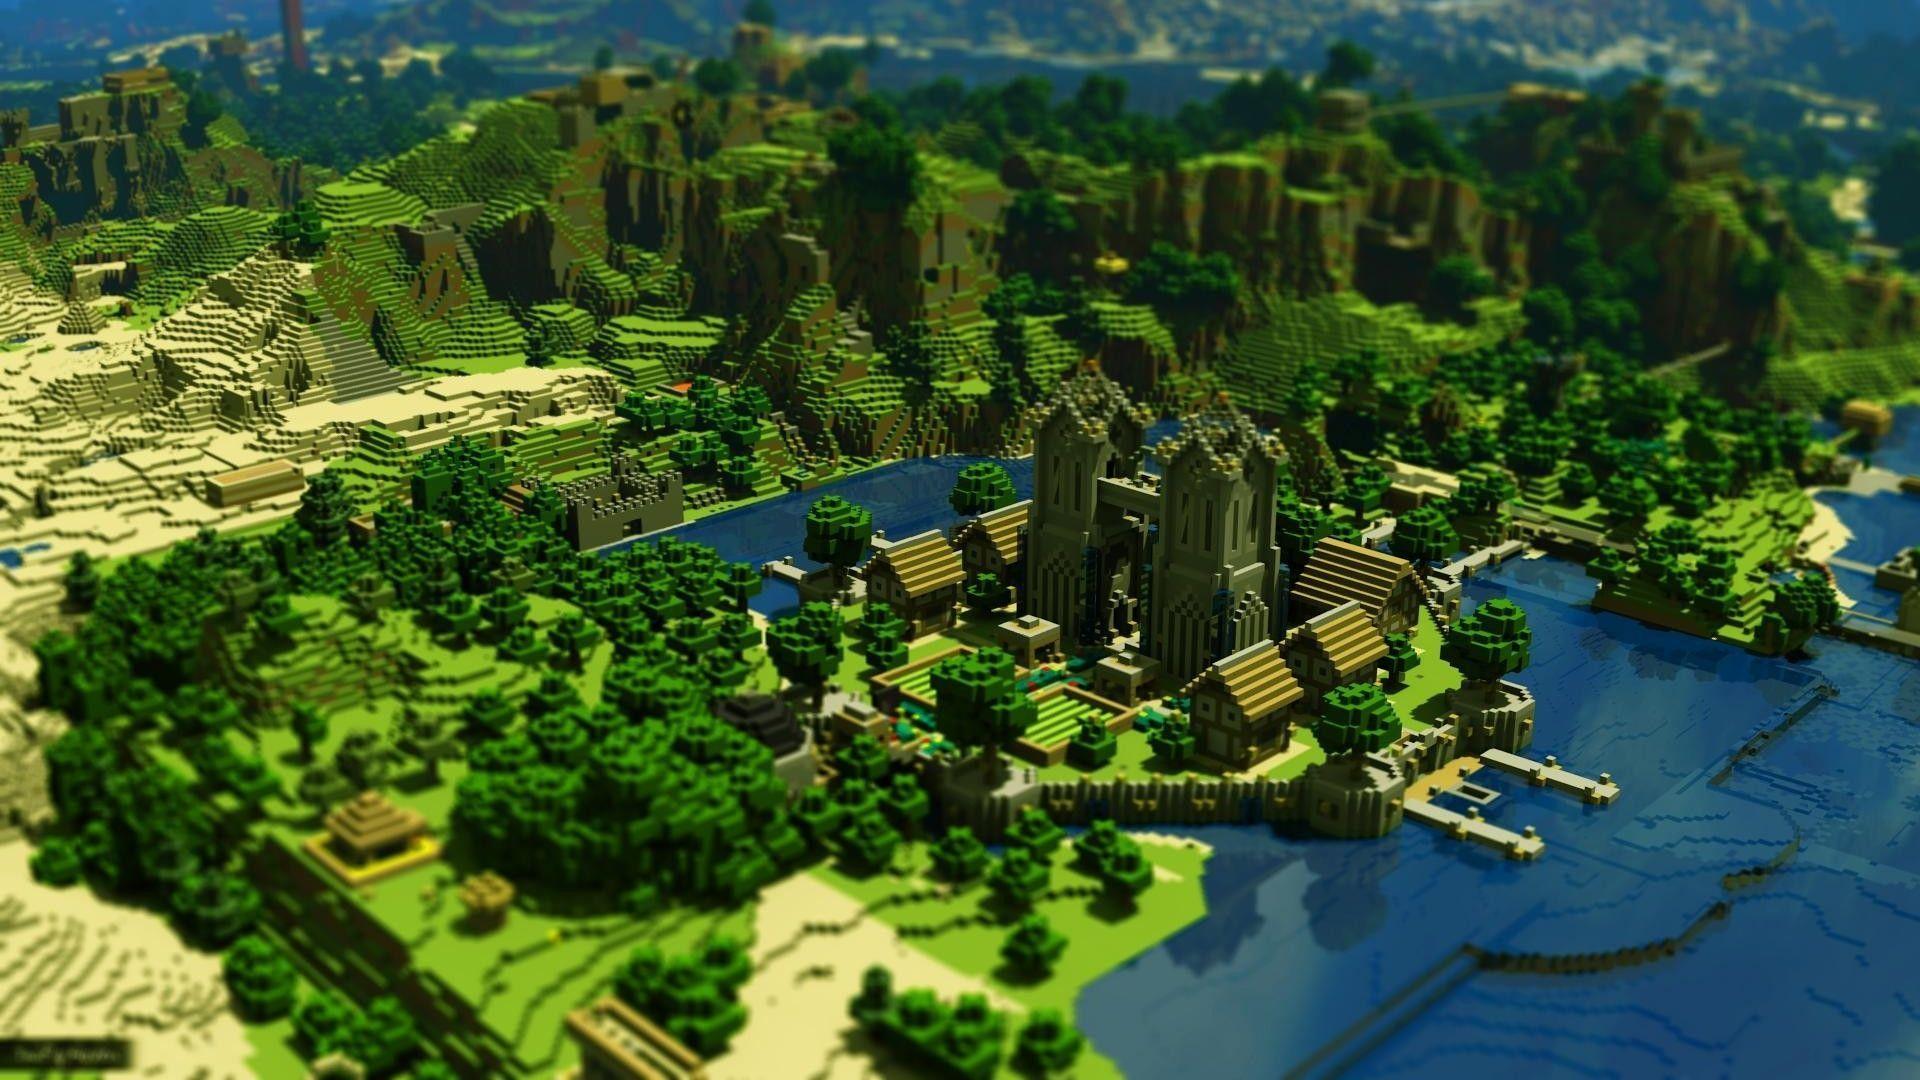 Wonderful Wallpaper Minecraft Laptop - 5c0209e1088ba016e9b28e9df2380166  Trends_645176.jpg